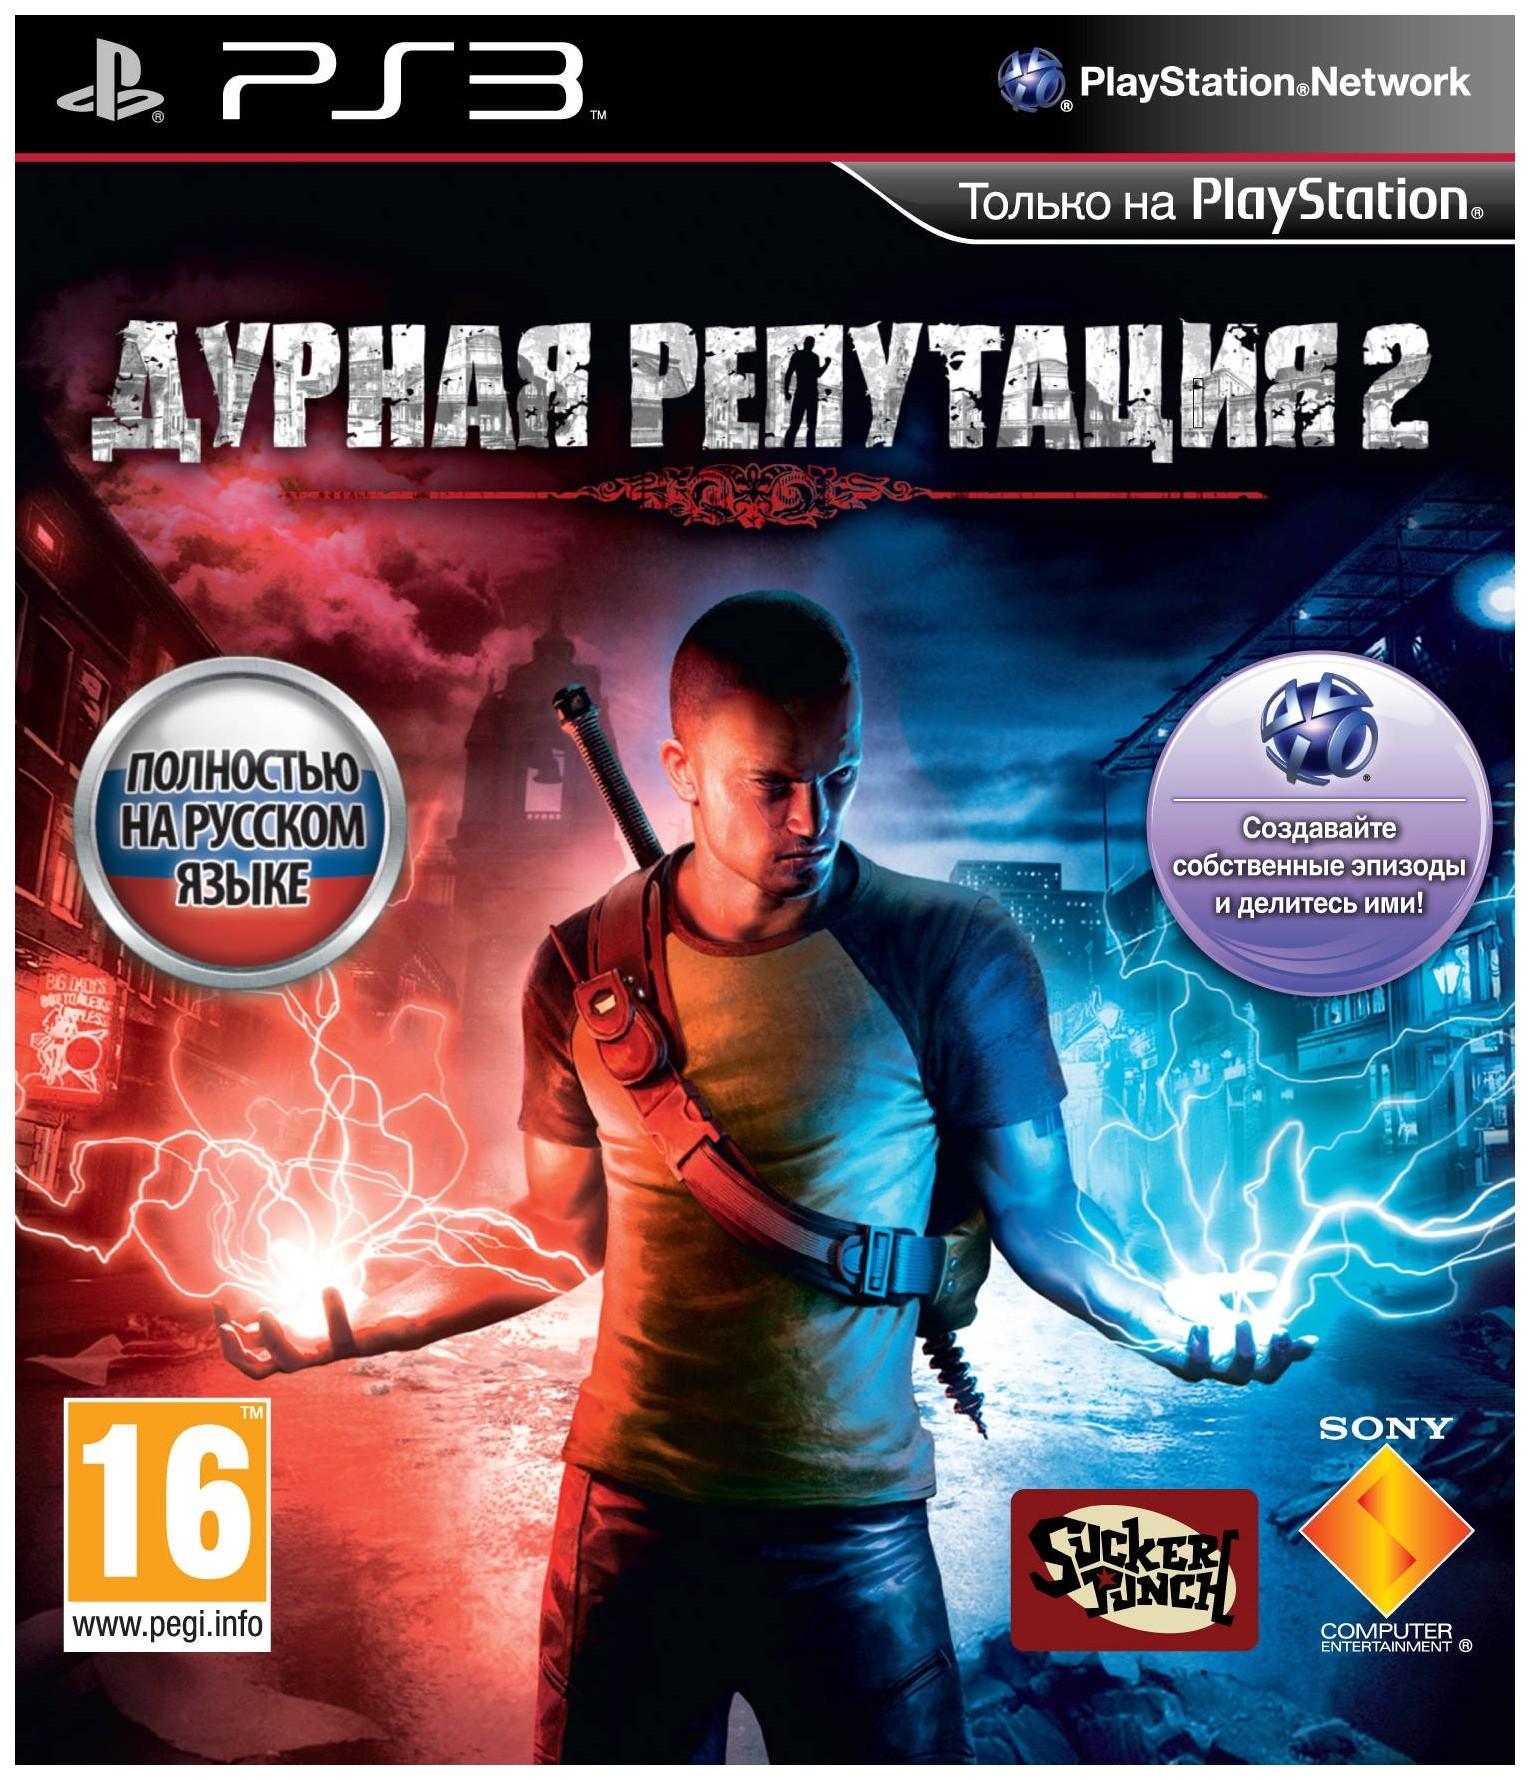 Игра Дурная репутация 2 (Essentials) для PlayStation 3 Sony Дурная репутация 2 (Essentials)